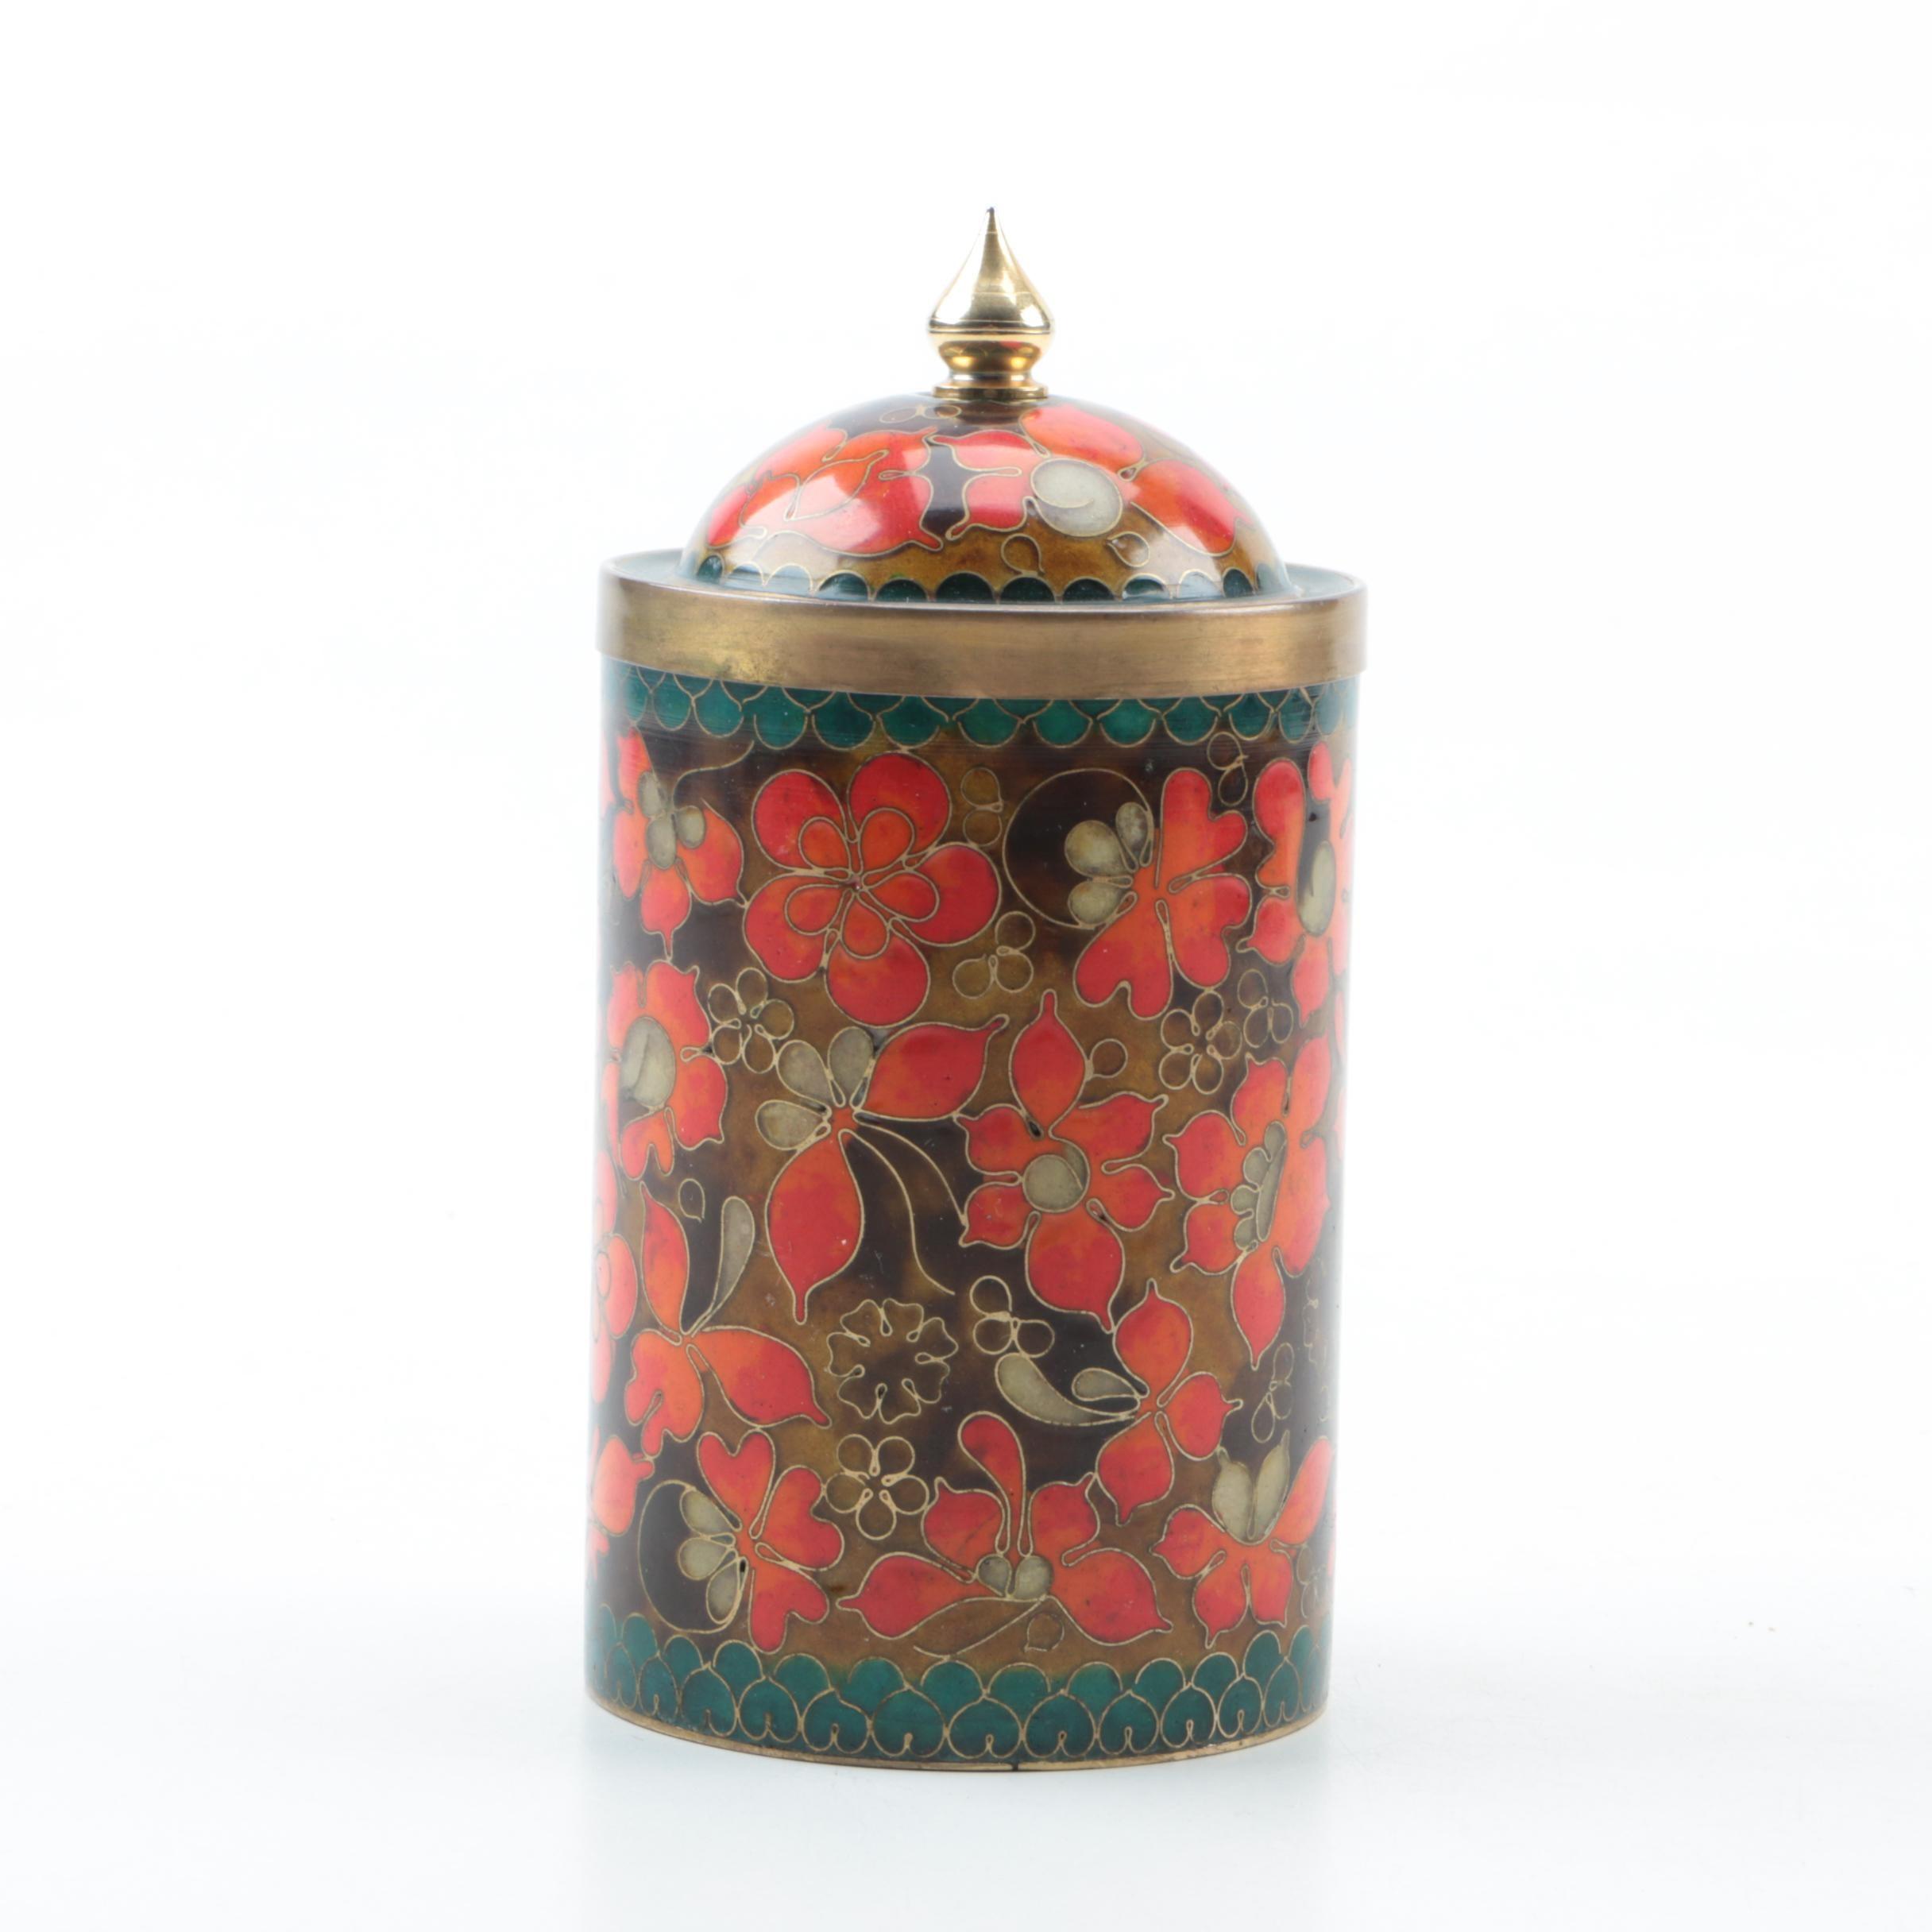 Lidded Cloisonné Jar